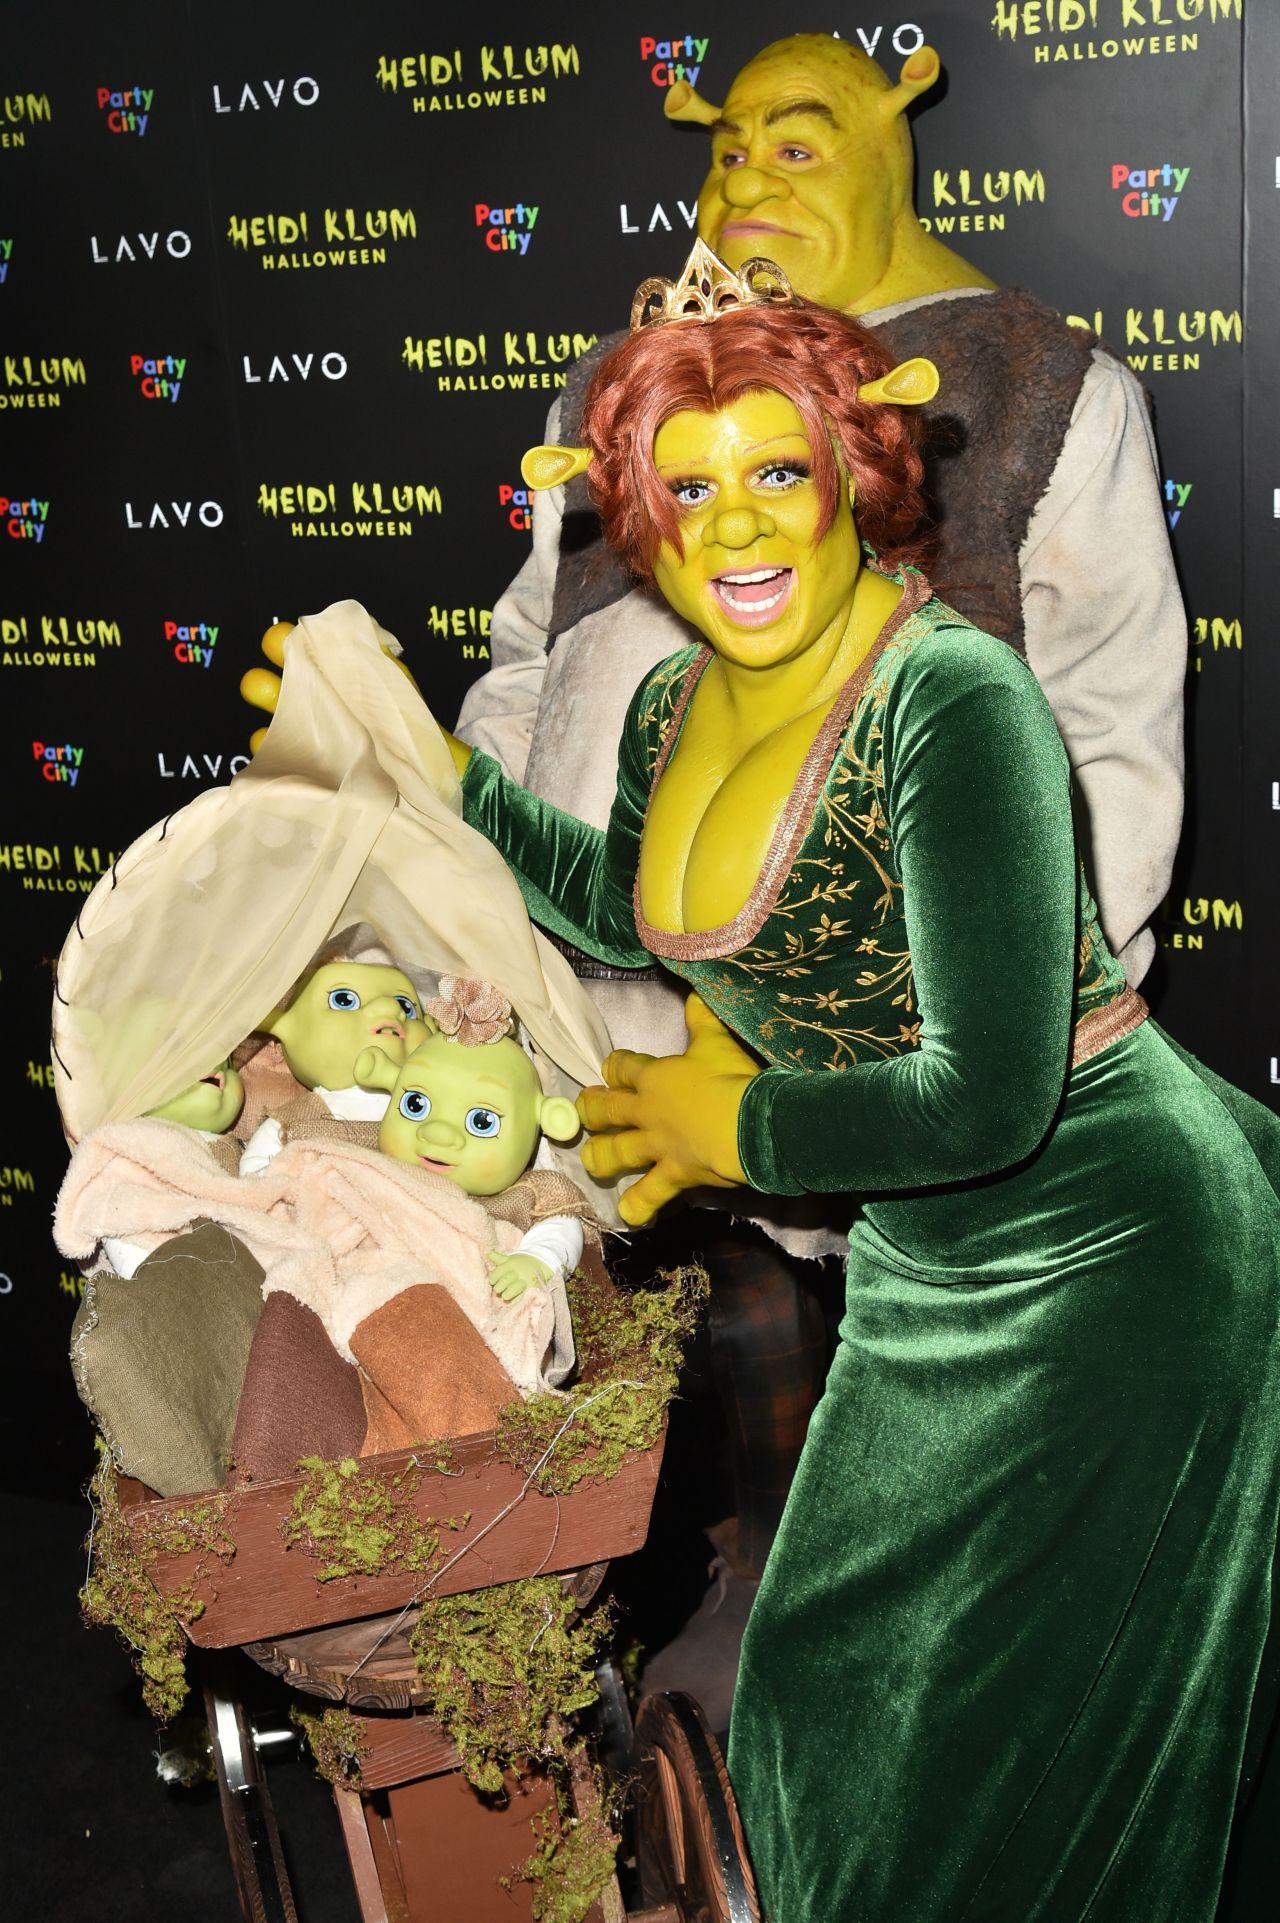 Jul 12, 2021· a halloween without heidi klum's beloved costume bash is scarier than ever. Heidi Klum - Heidi Klum's Halloween Party 10/31/2018 • CelebMafia